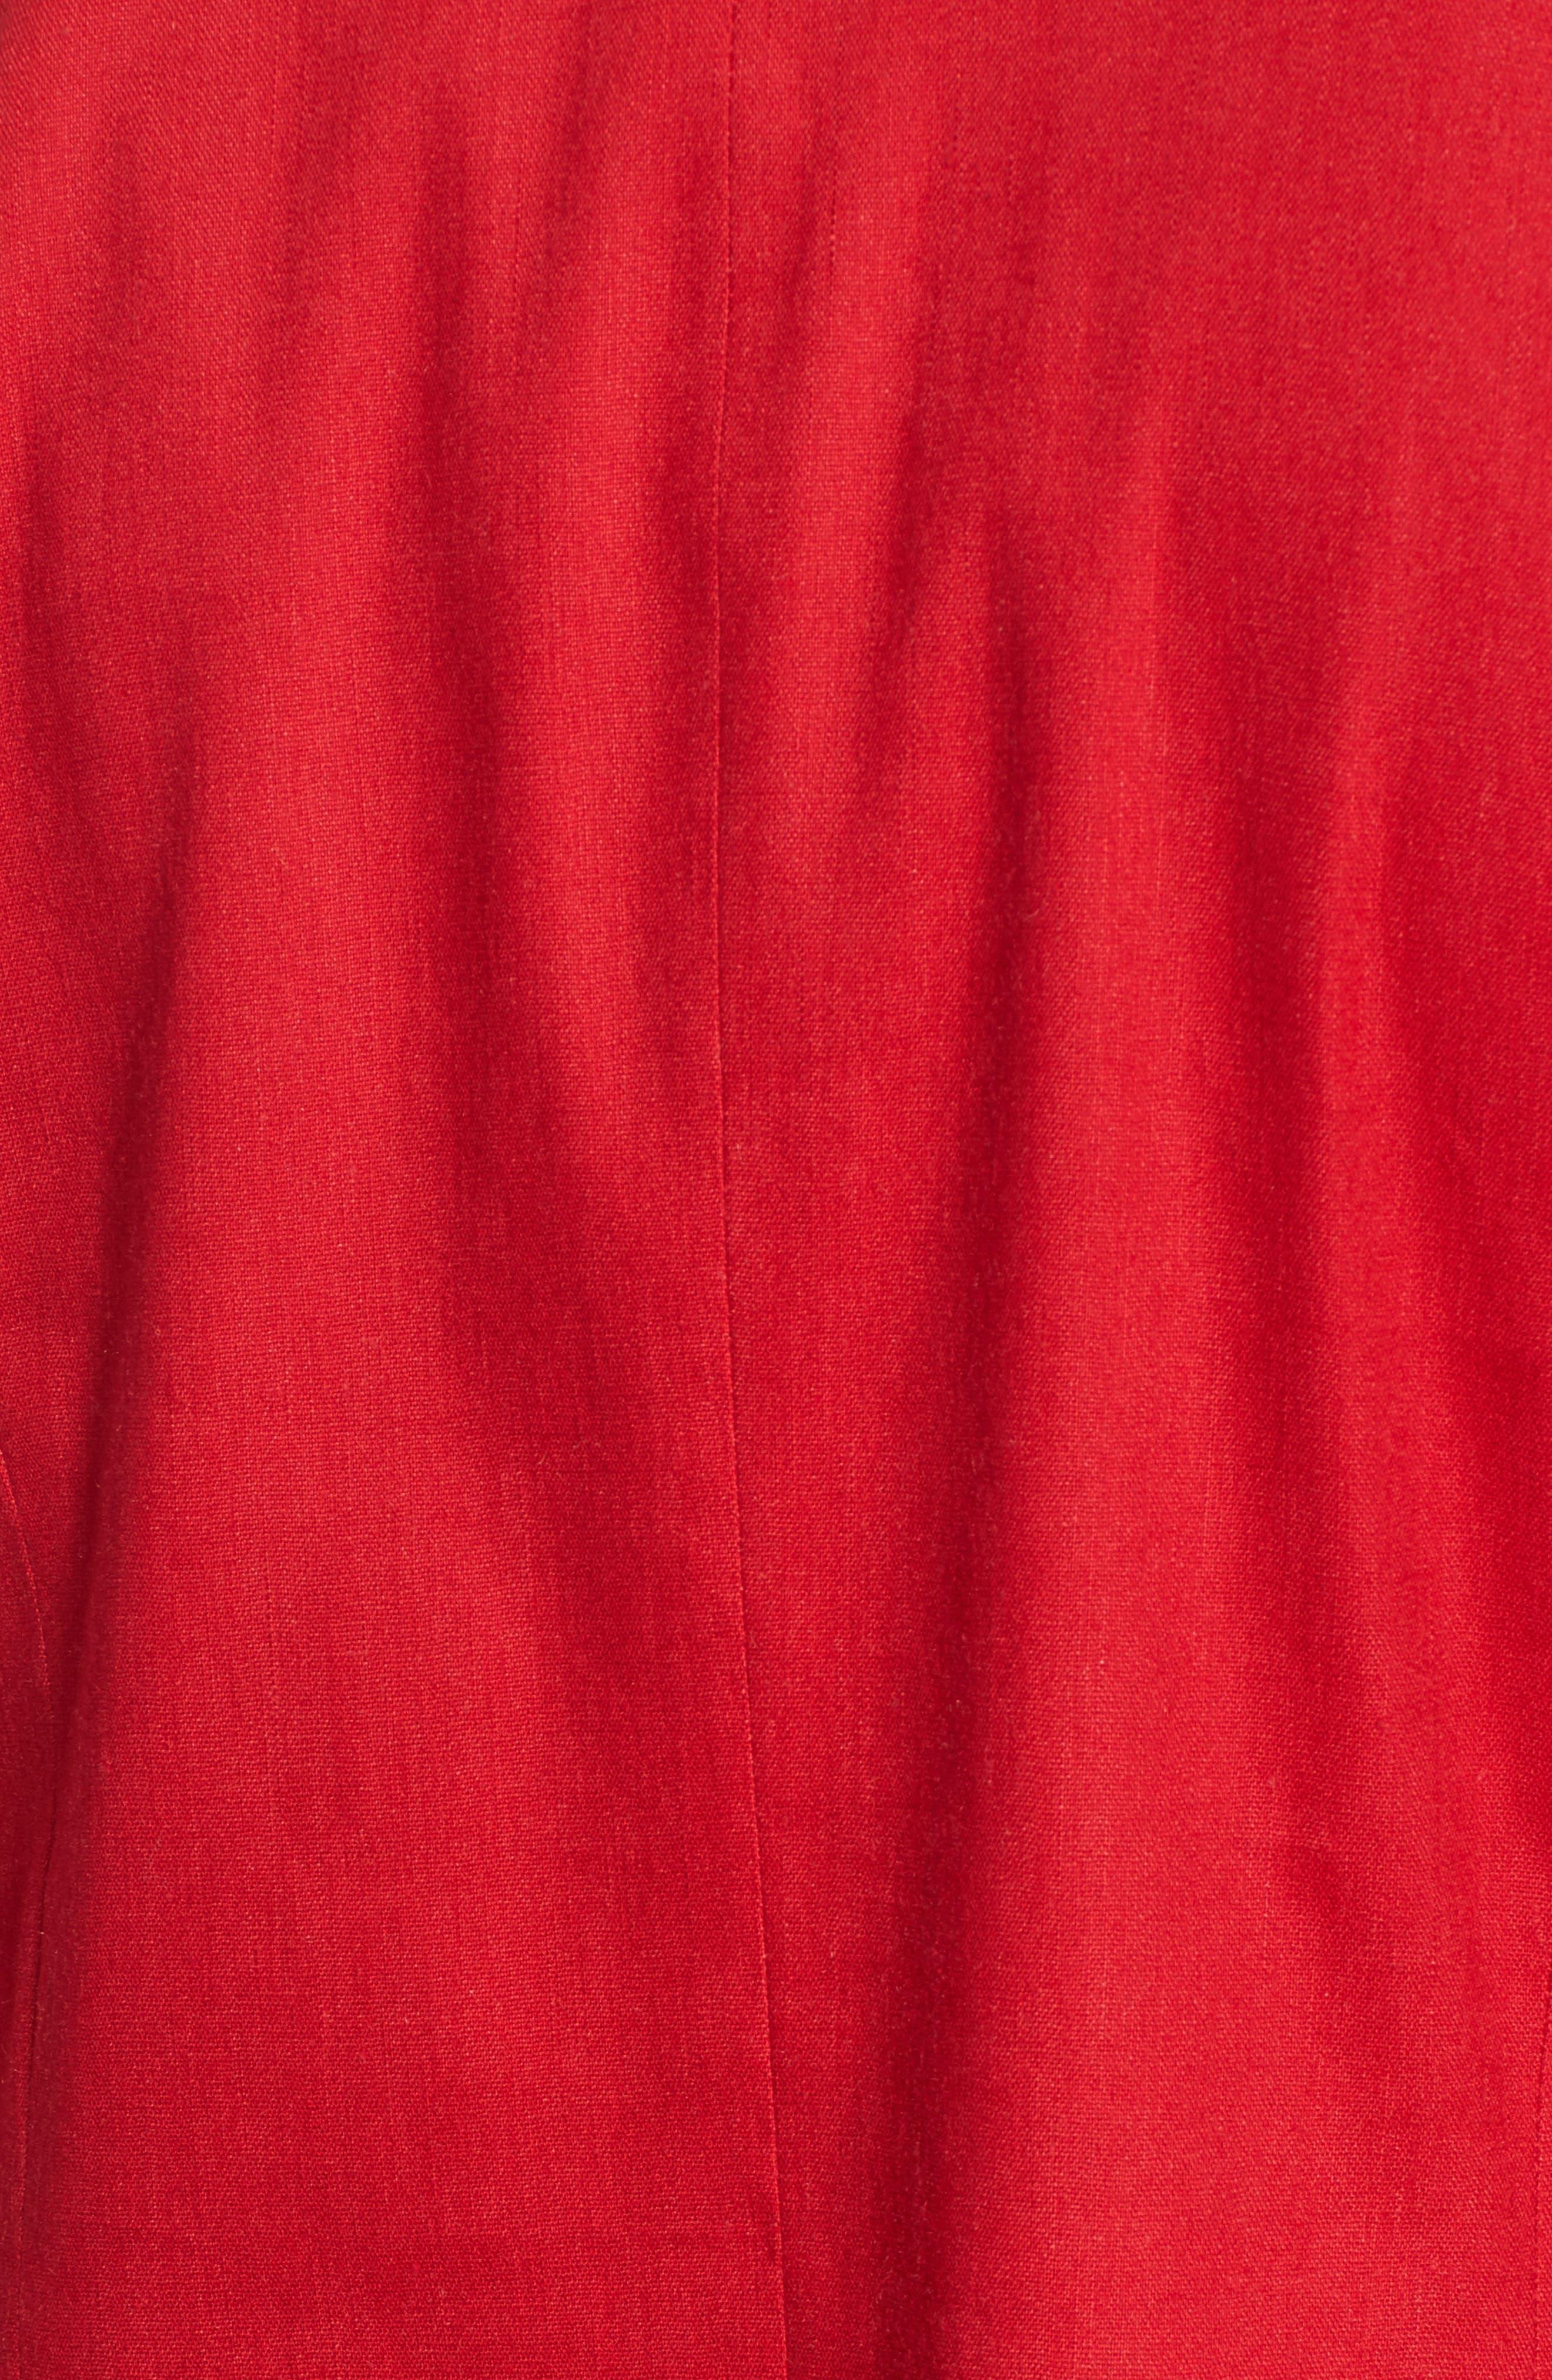 Double Breasted Linen Blend Blazer,                             Alternate thumbnail 29, color,